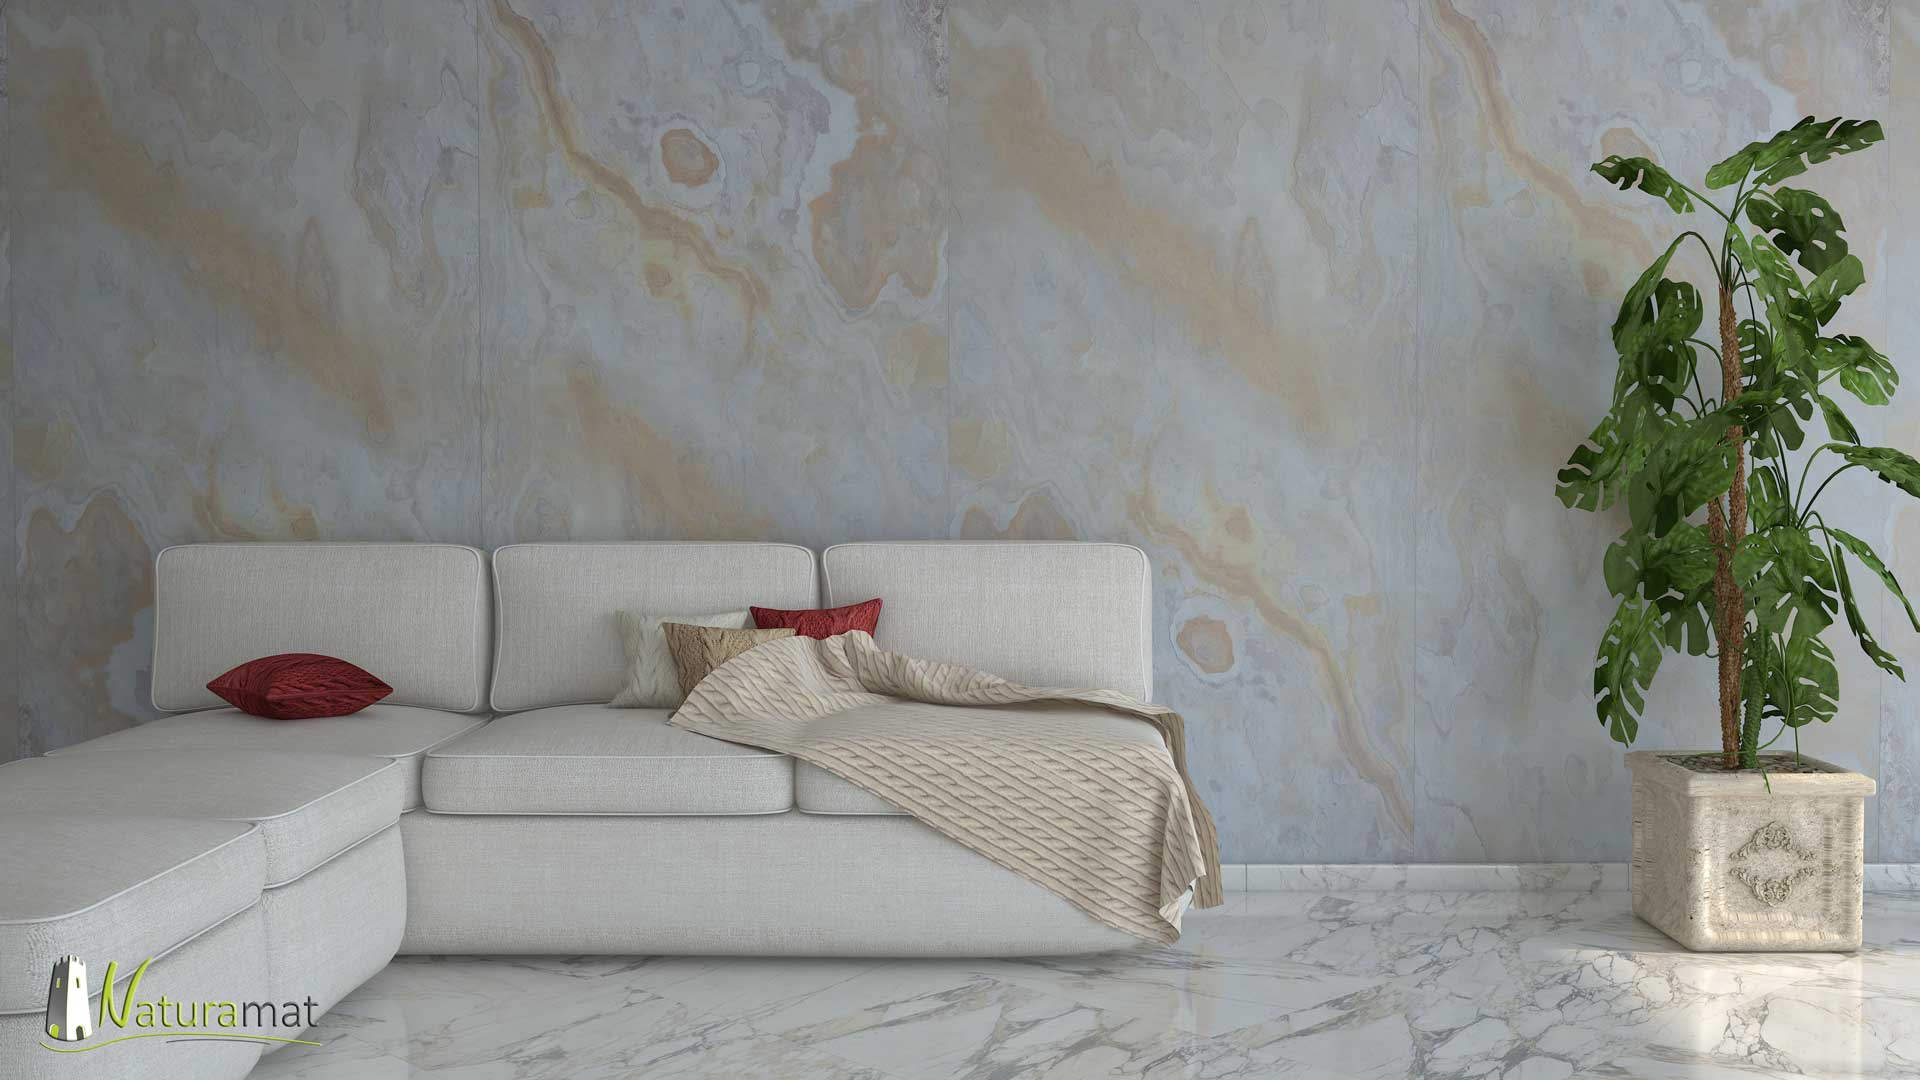 Feuille de pierre naturelle flexible Sanjeevani White